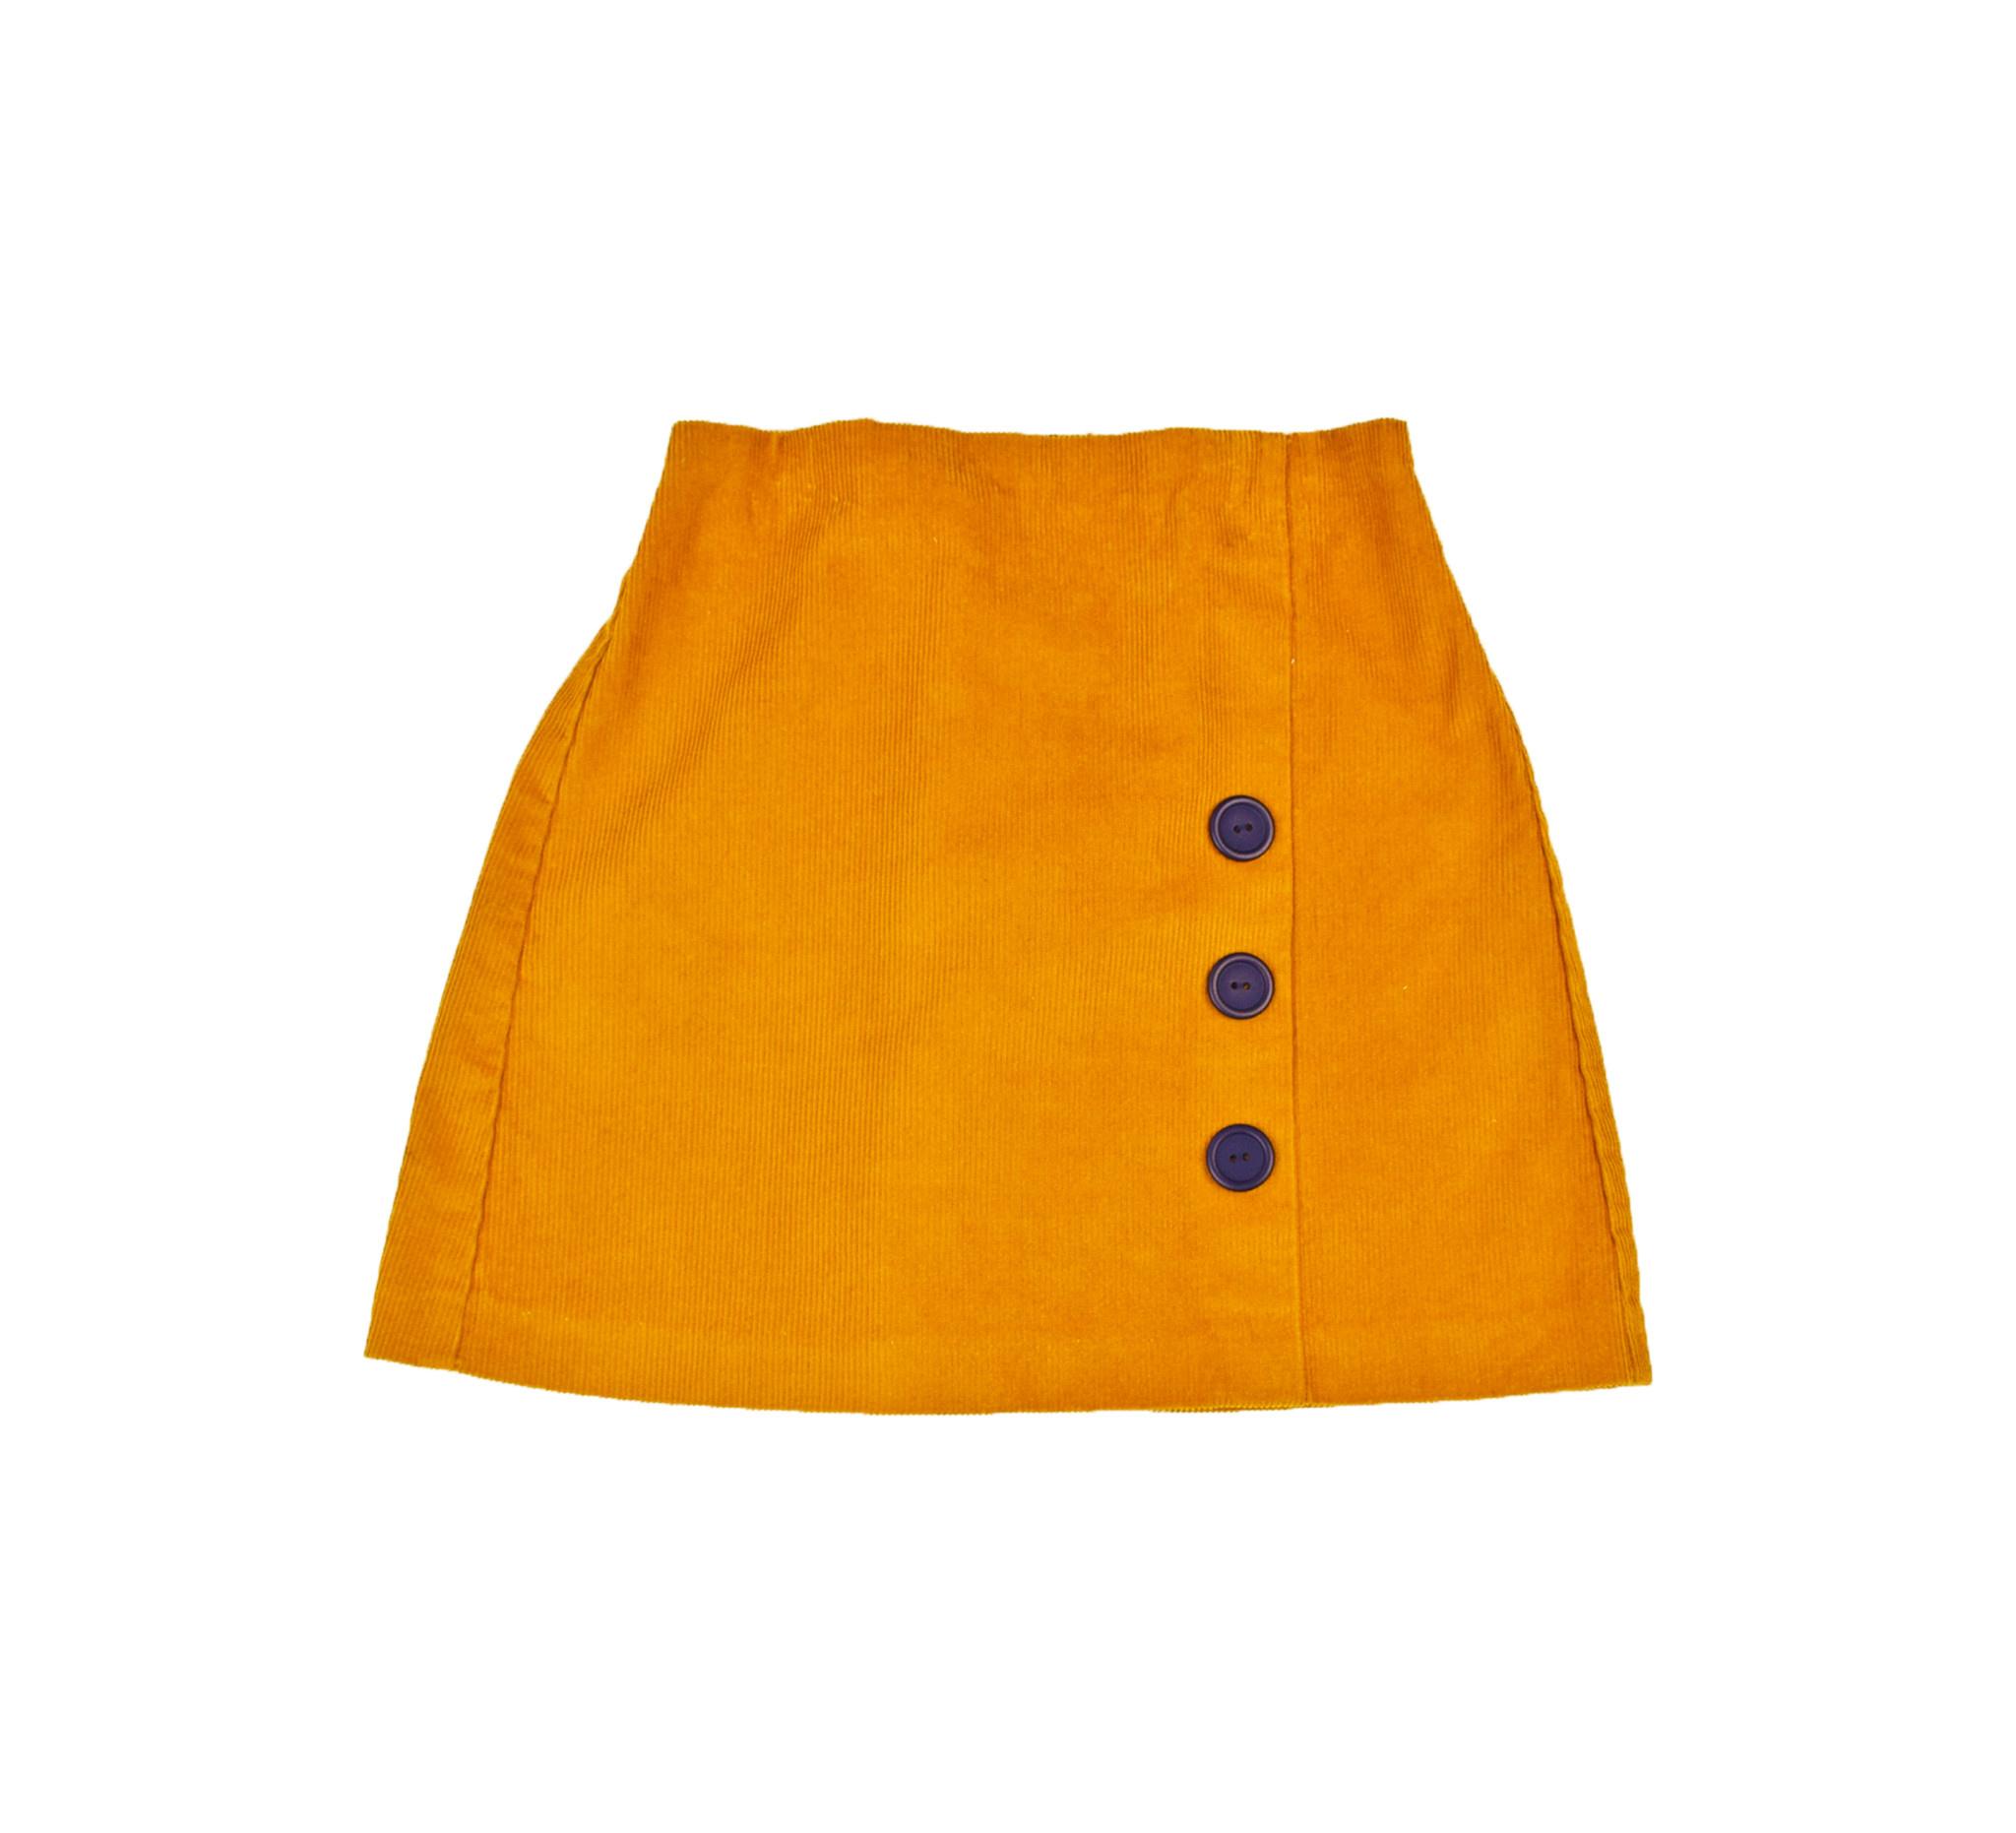 Maggie Breen Mustard Corduroy Skirt